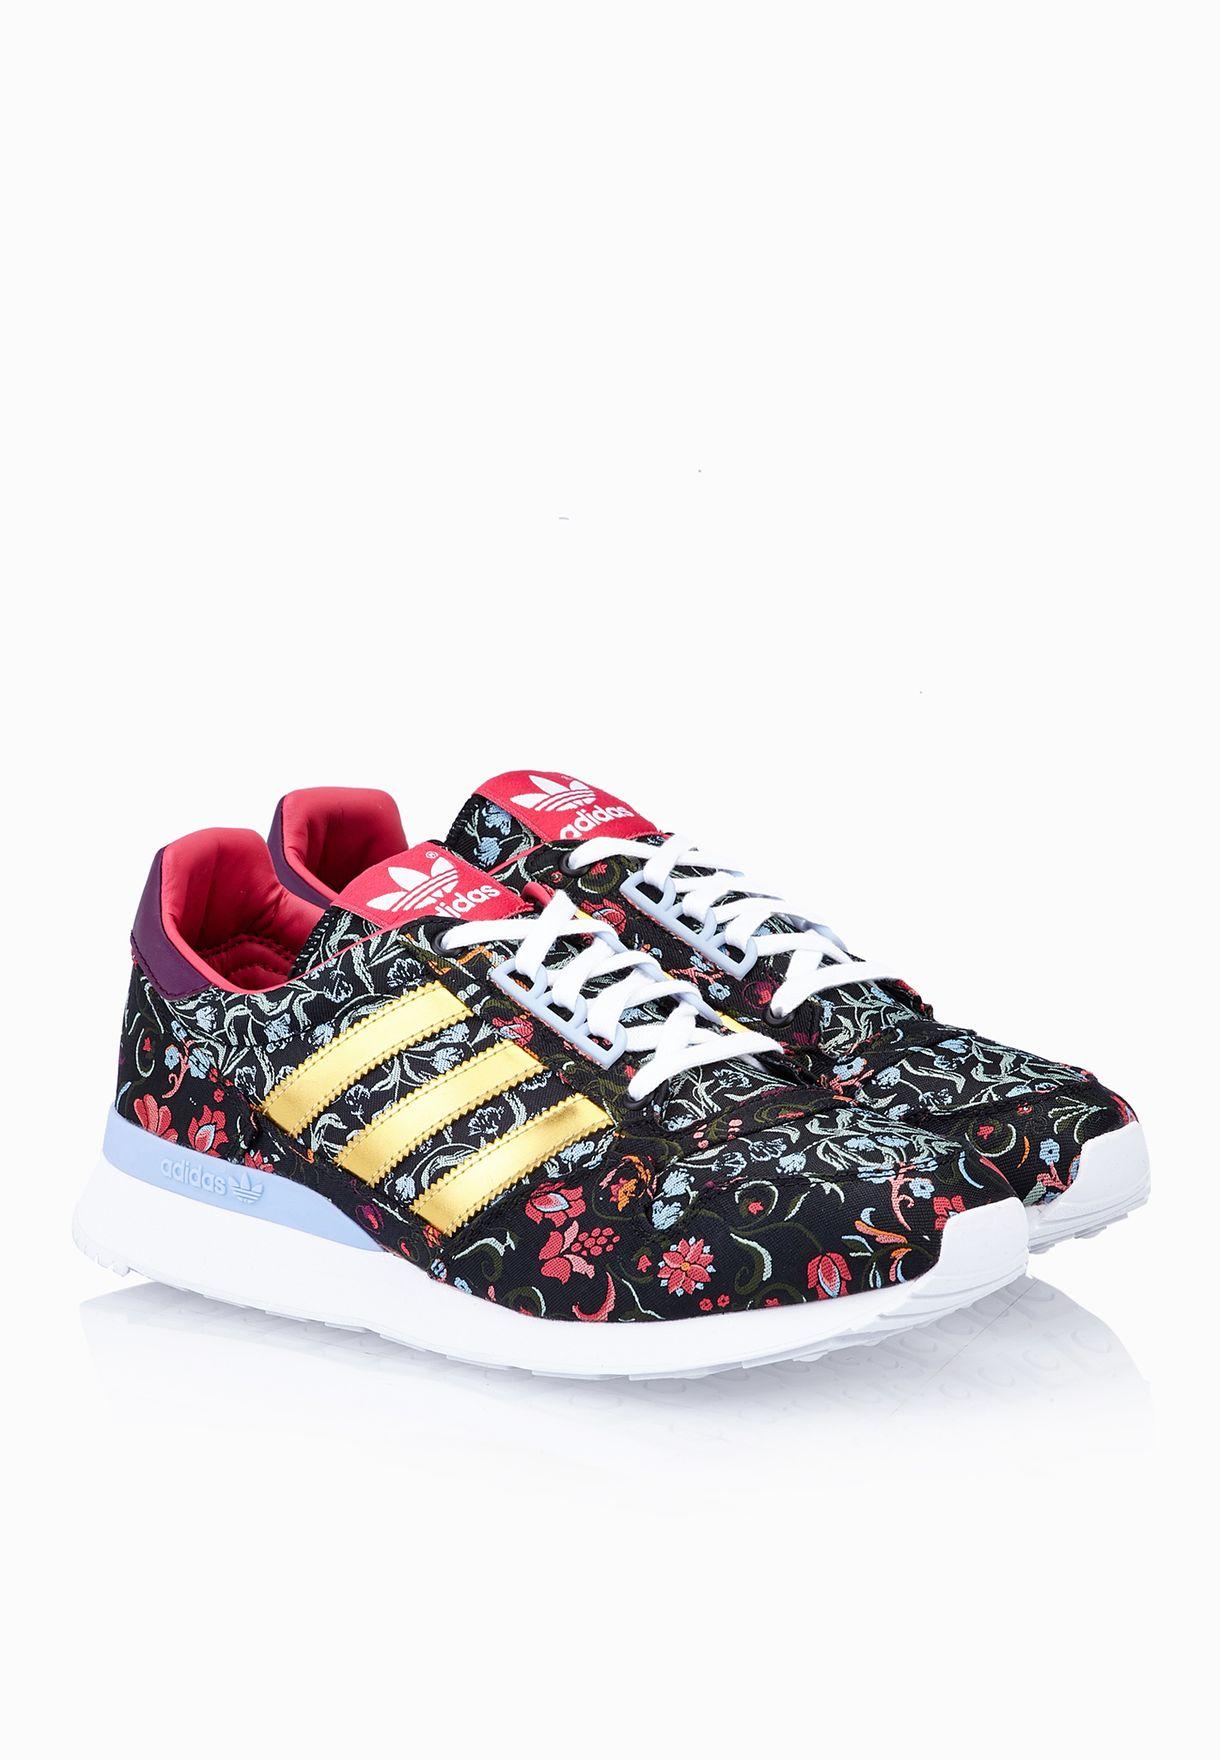 b1890c16a461e Shop adidas Originals multicolor ZX 500 OG Sneakers S77319 for Women ...